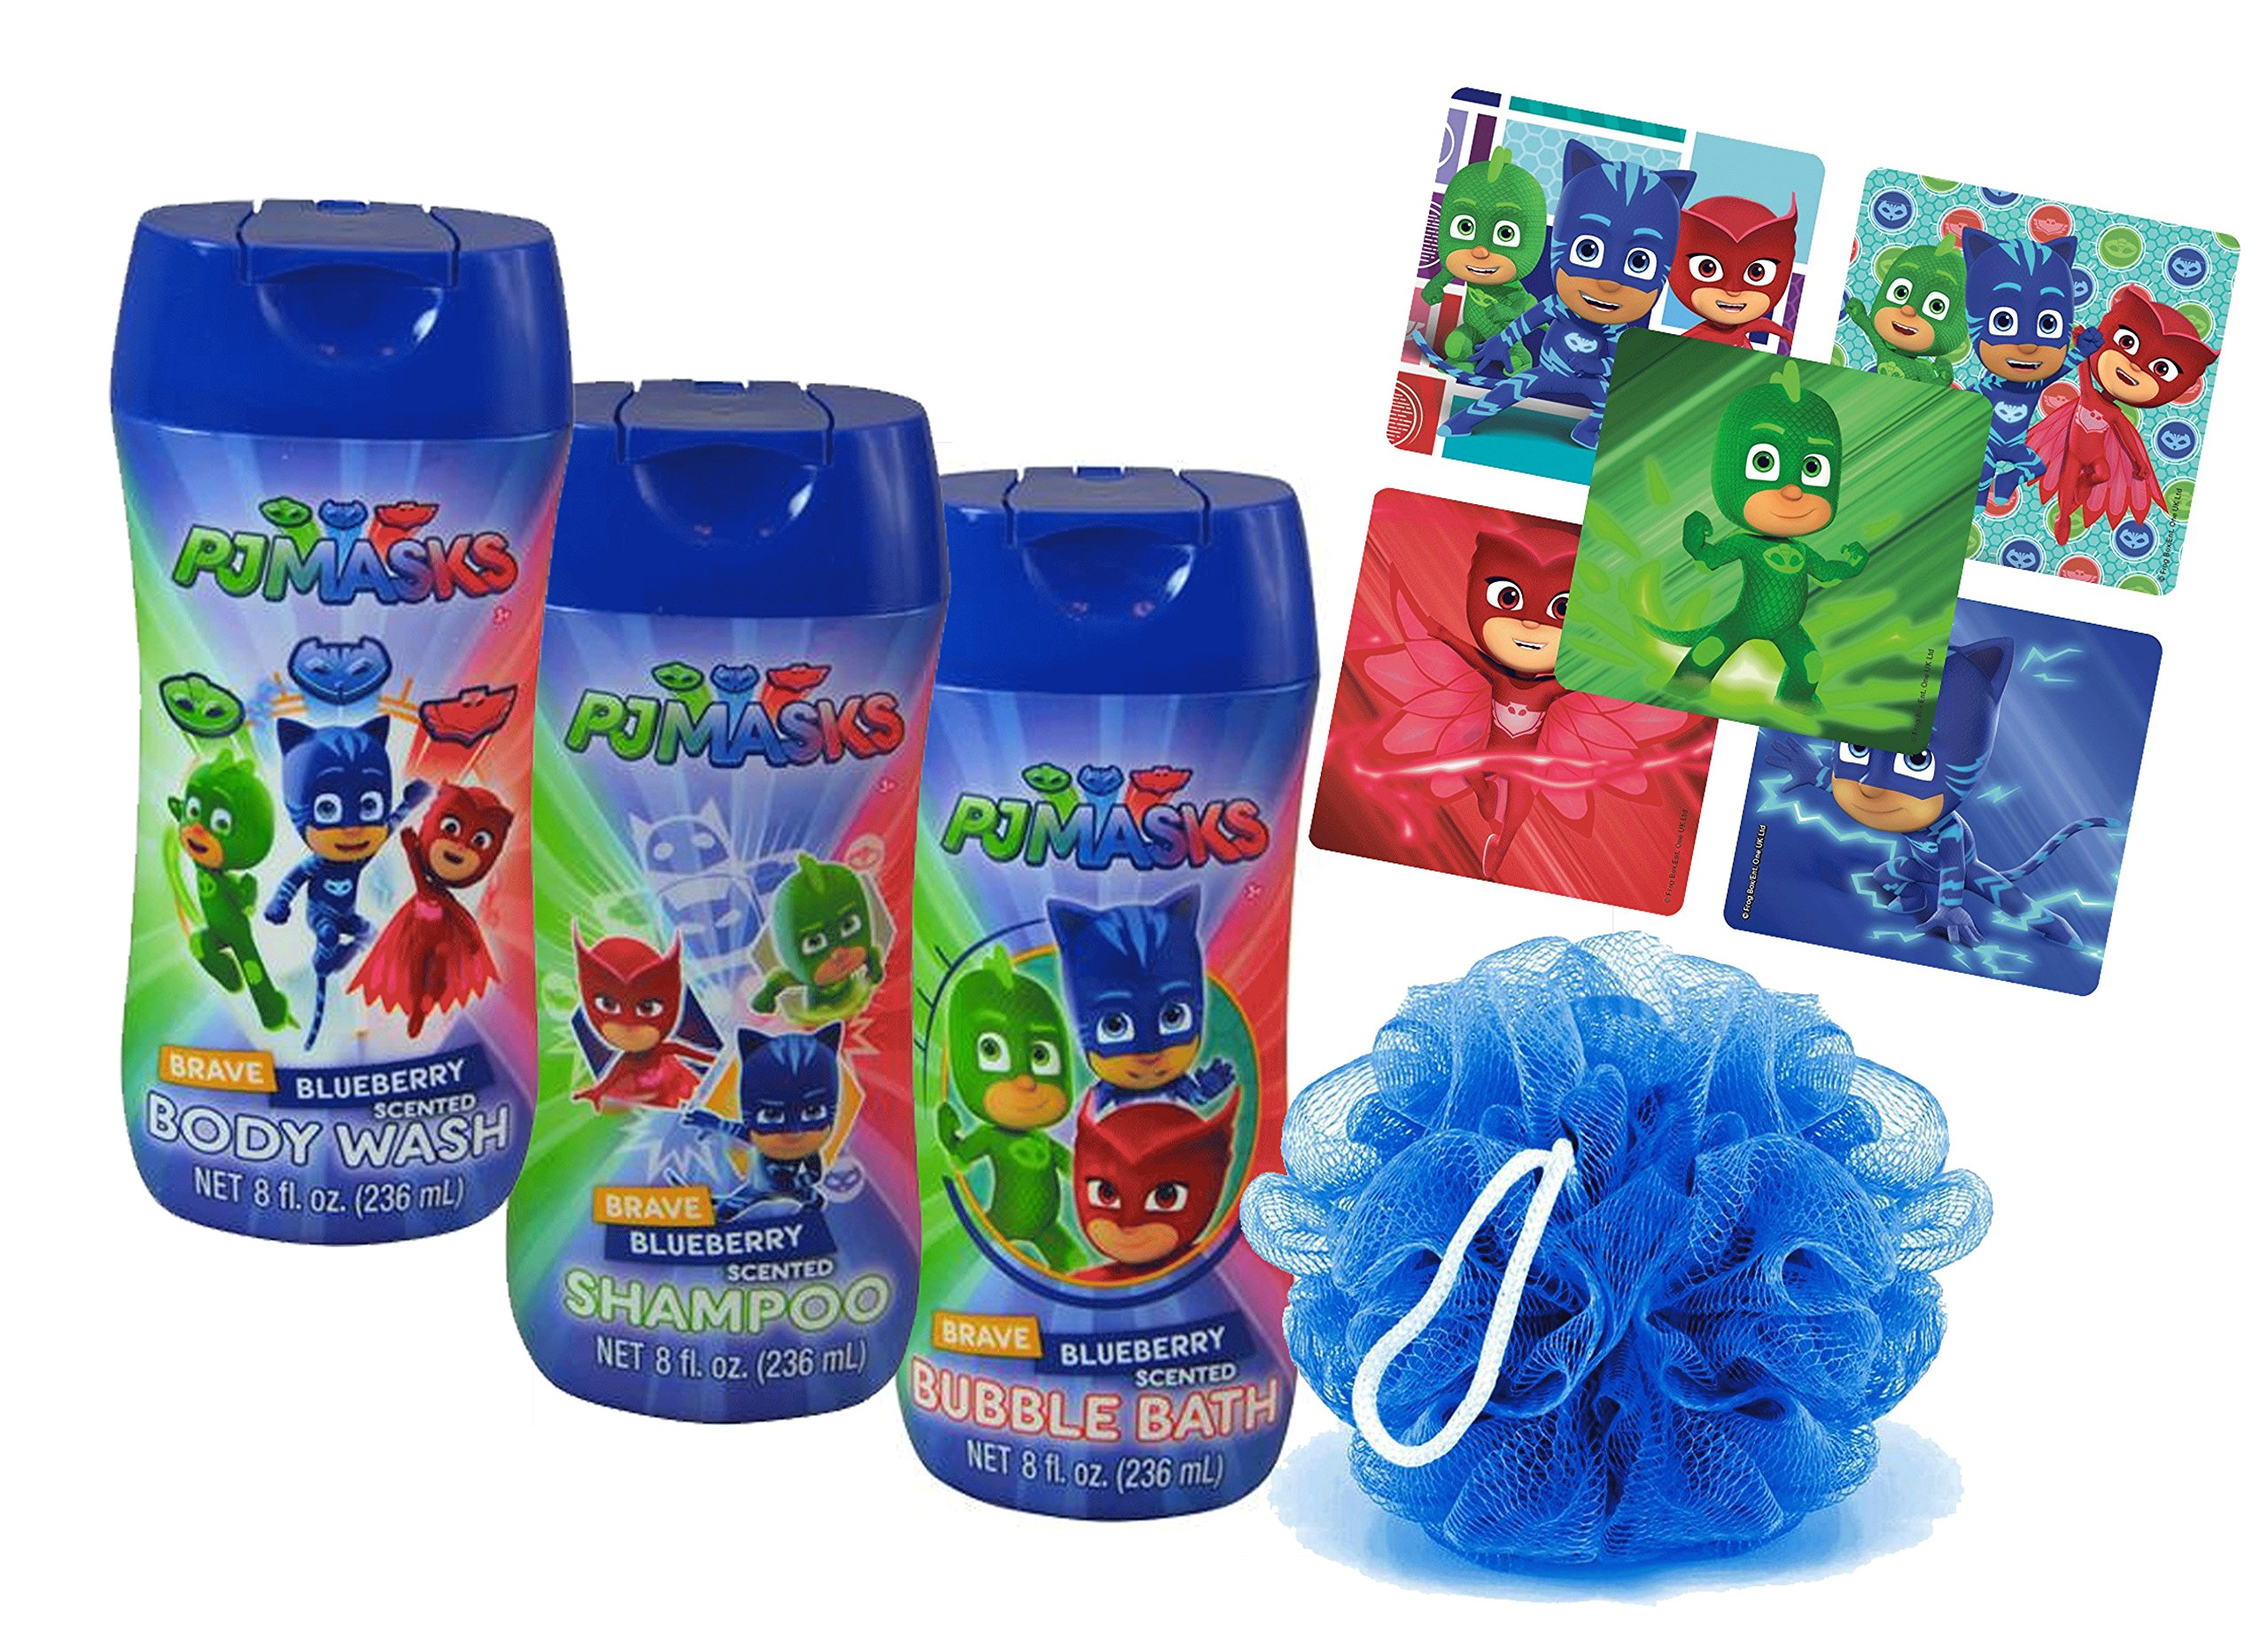 Pj Masks Super Hero 4pc Bathroom Collection! Includes Body Wash, Shampoo, Bubble Bath & Bath Scrubby! Plus Bonus PJ Mask Character Stickers!